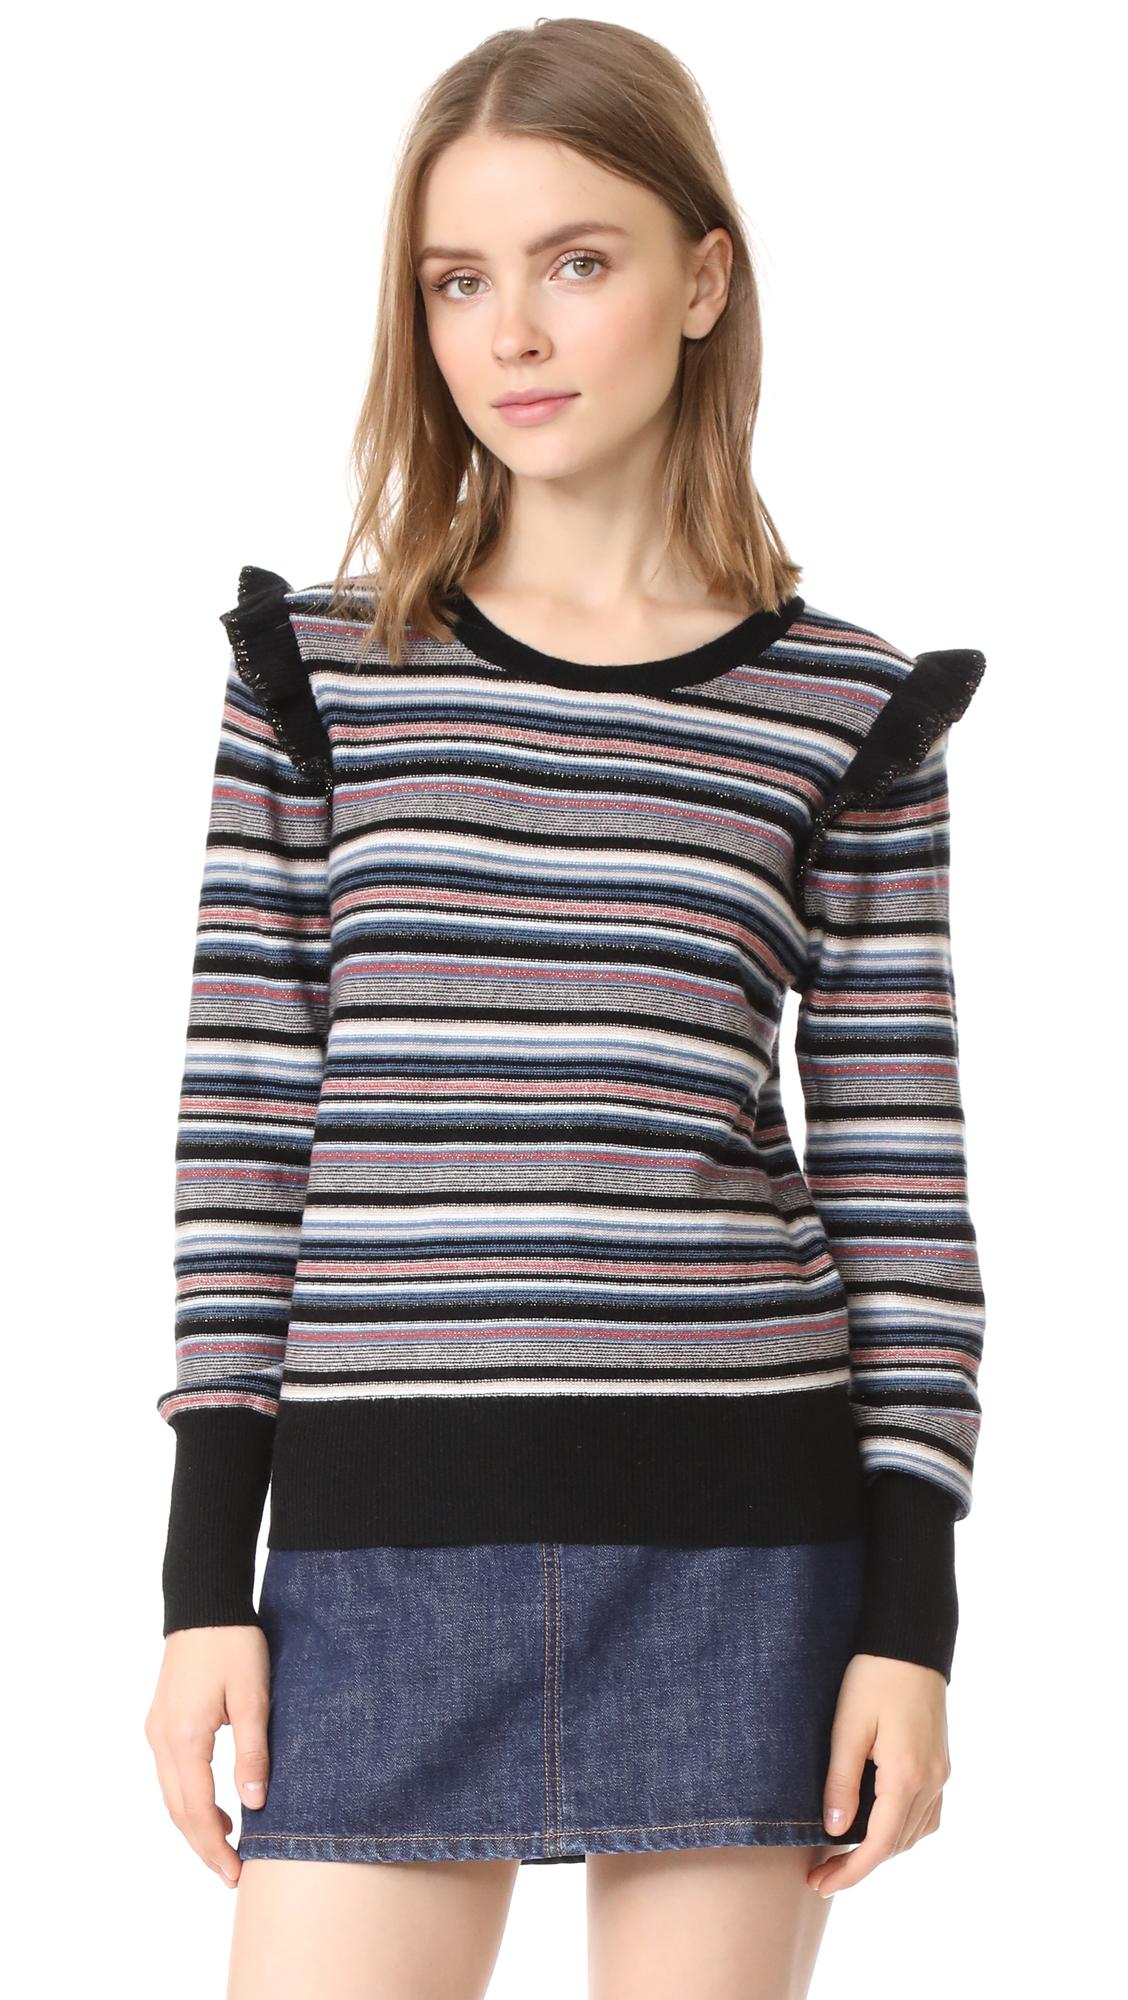 Joie Cais C Sweater - Multi Stripe